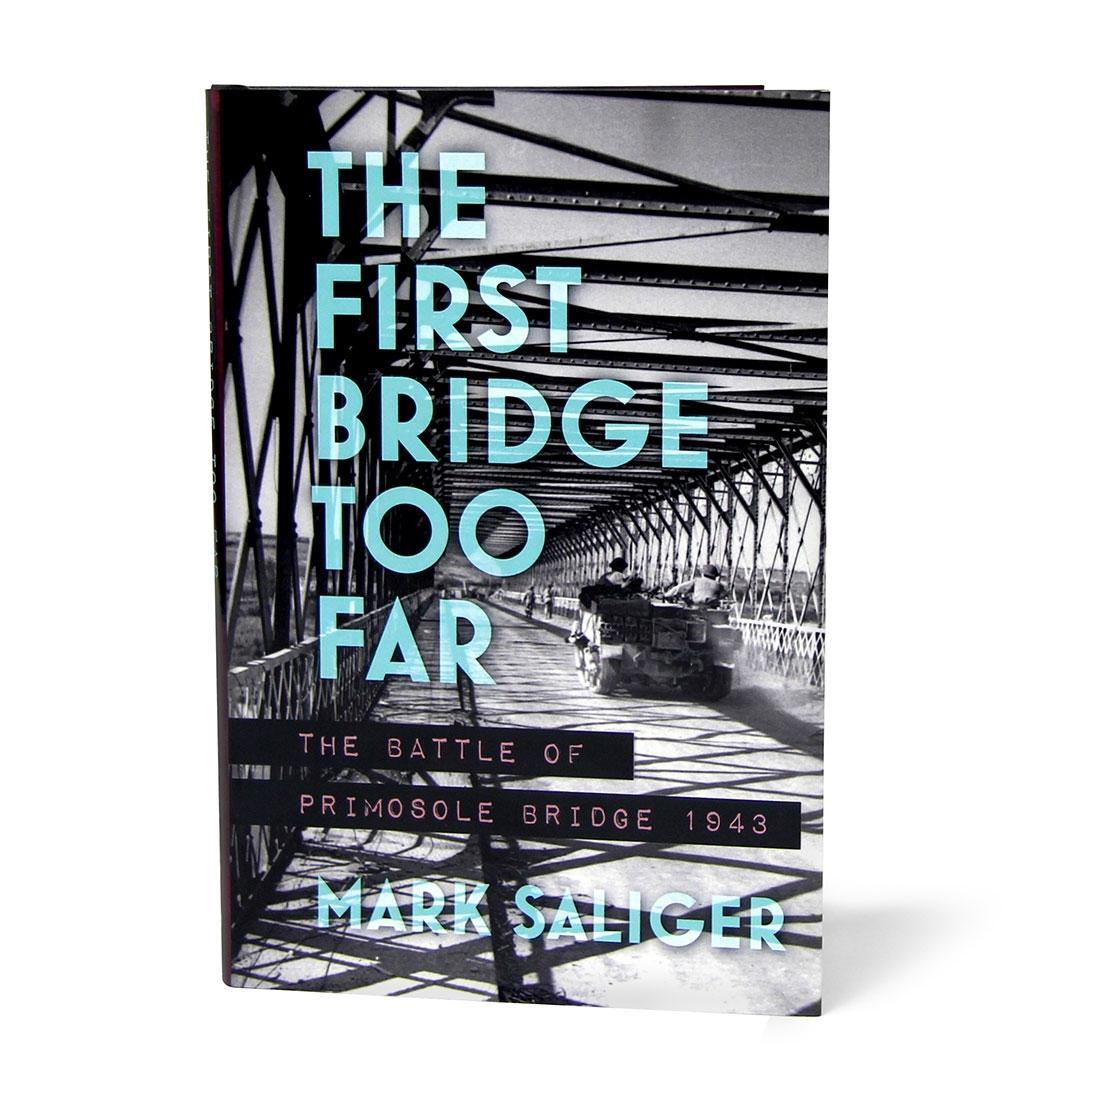 The First Bridge Too Far, The Battle of Primosole Bridge 1943 by Mark Saliger (Book)